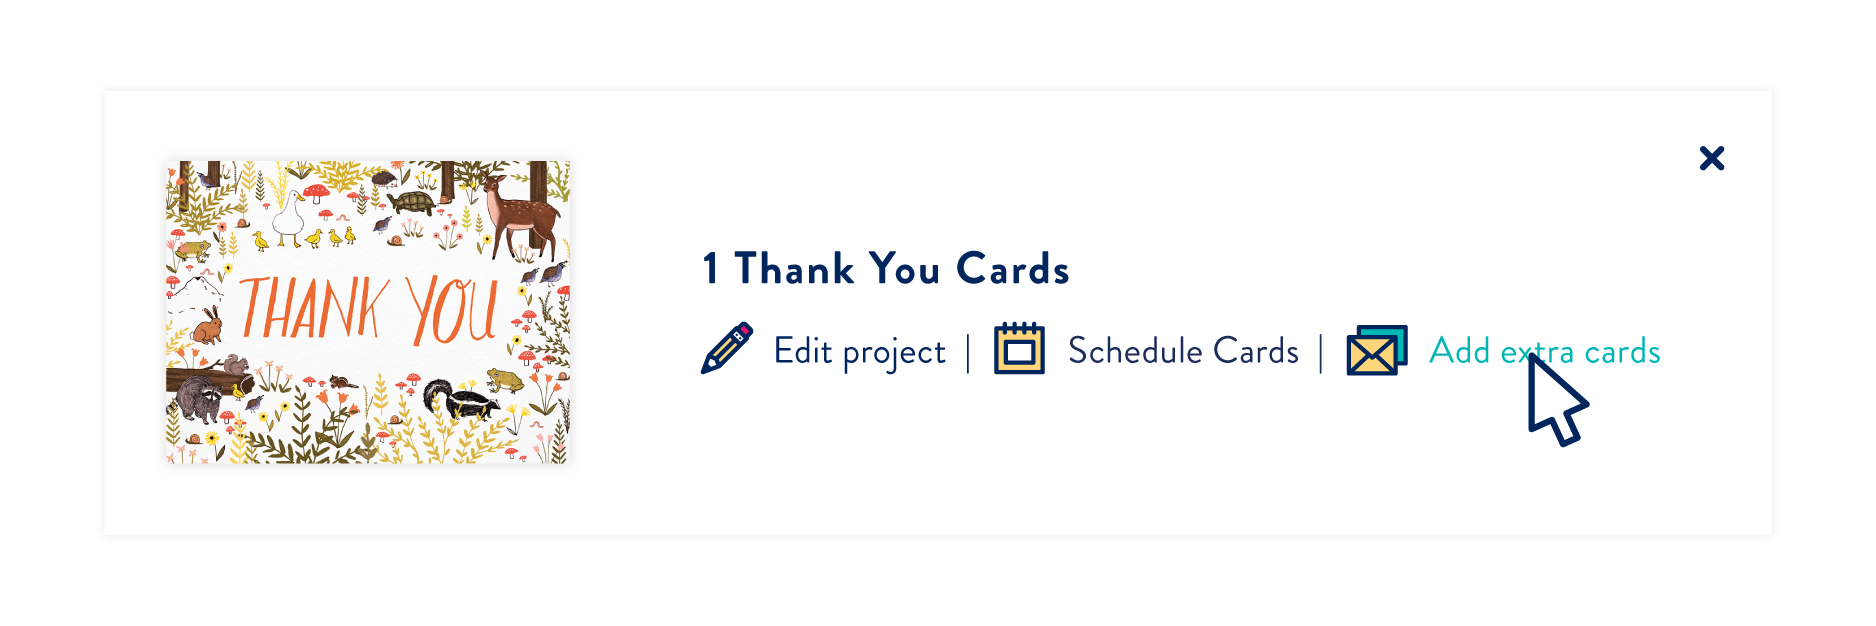 steps_box_cards_03